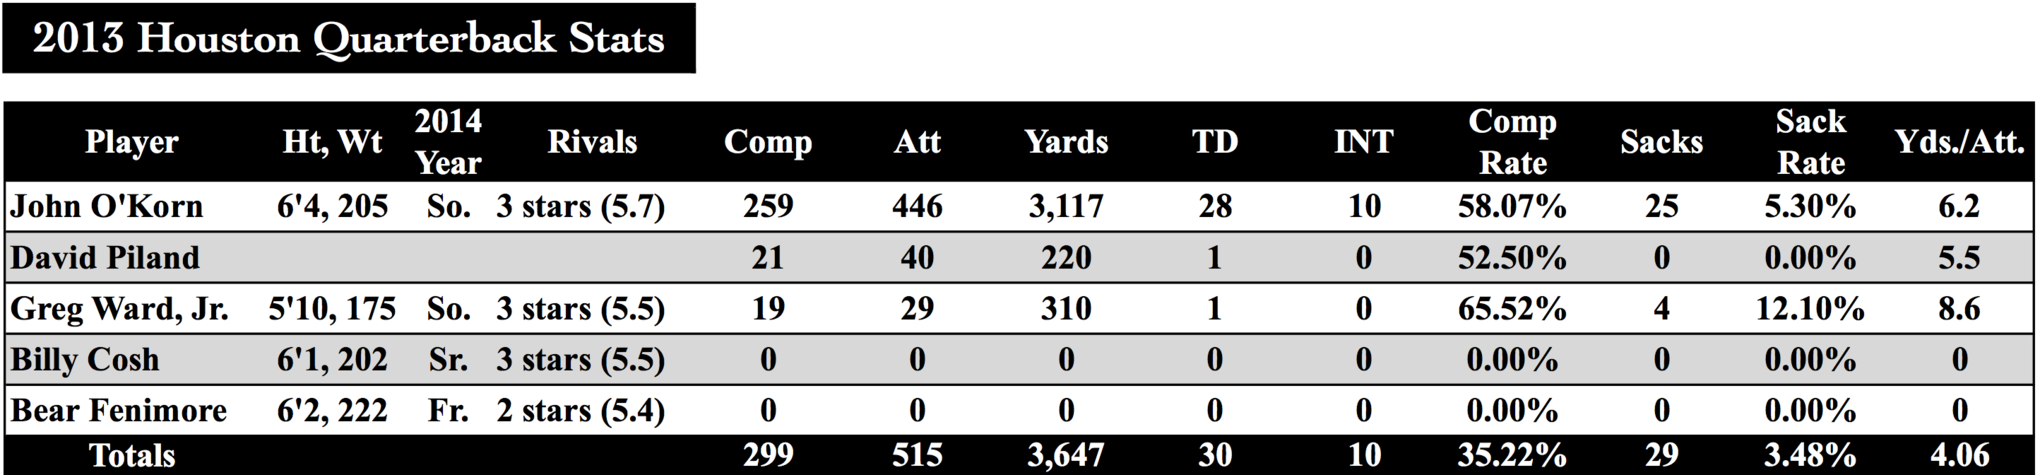 2013_houston_quarterback_stats___sb_nation_voodoofive.com_by_matthew_manuri